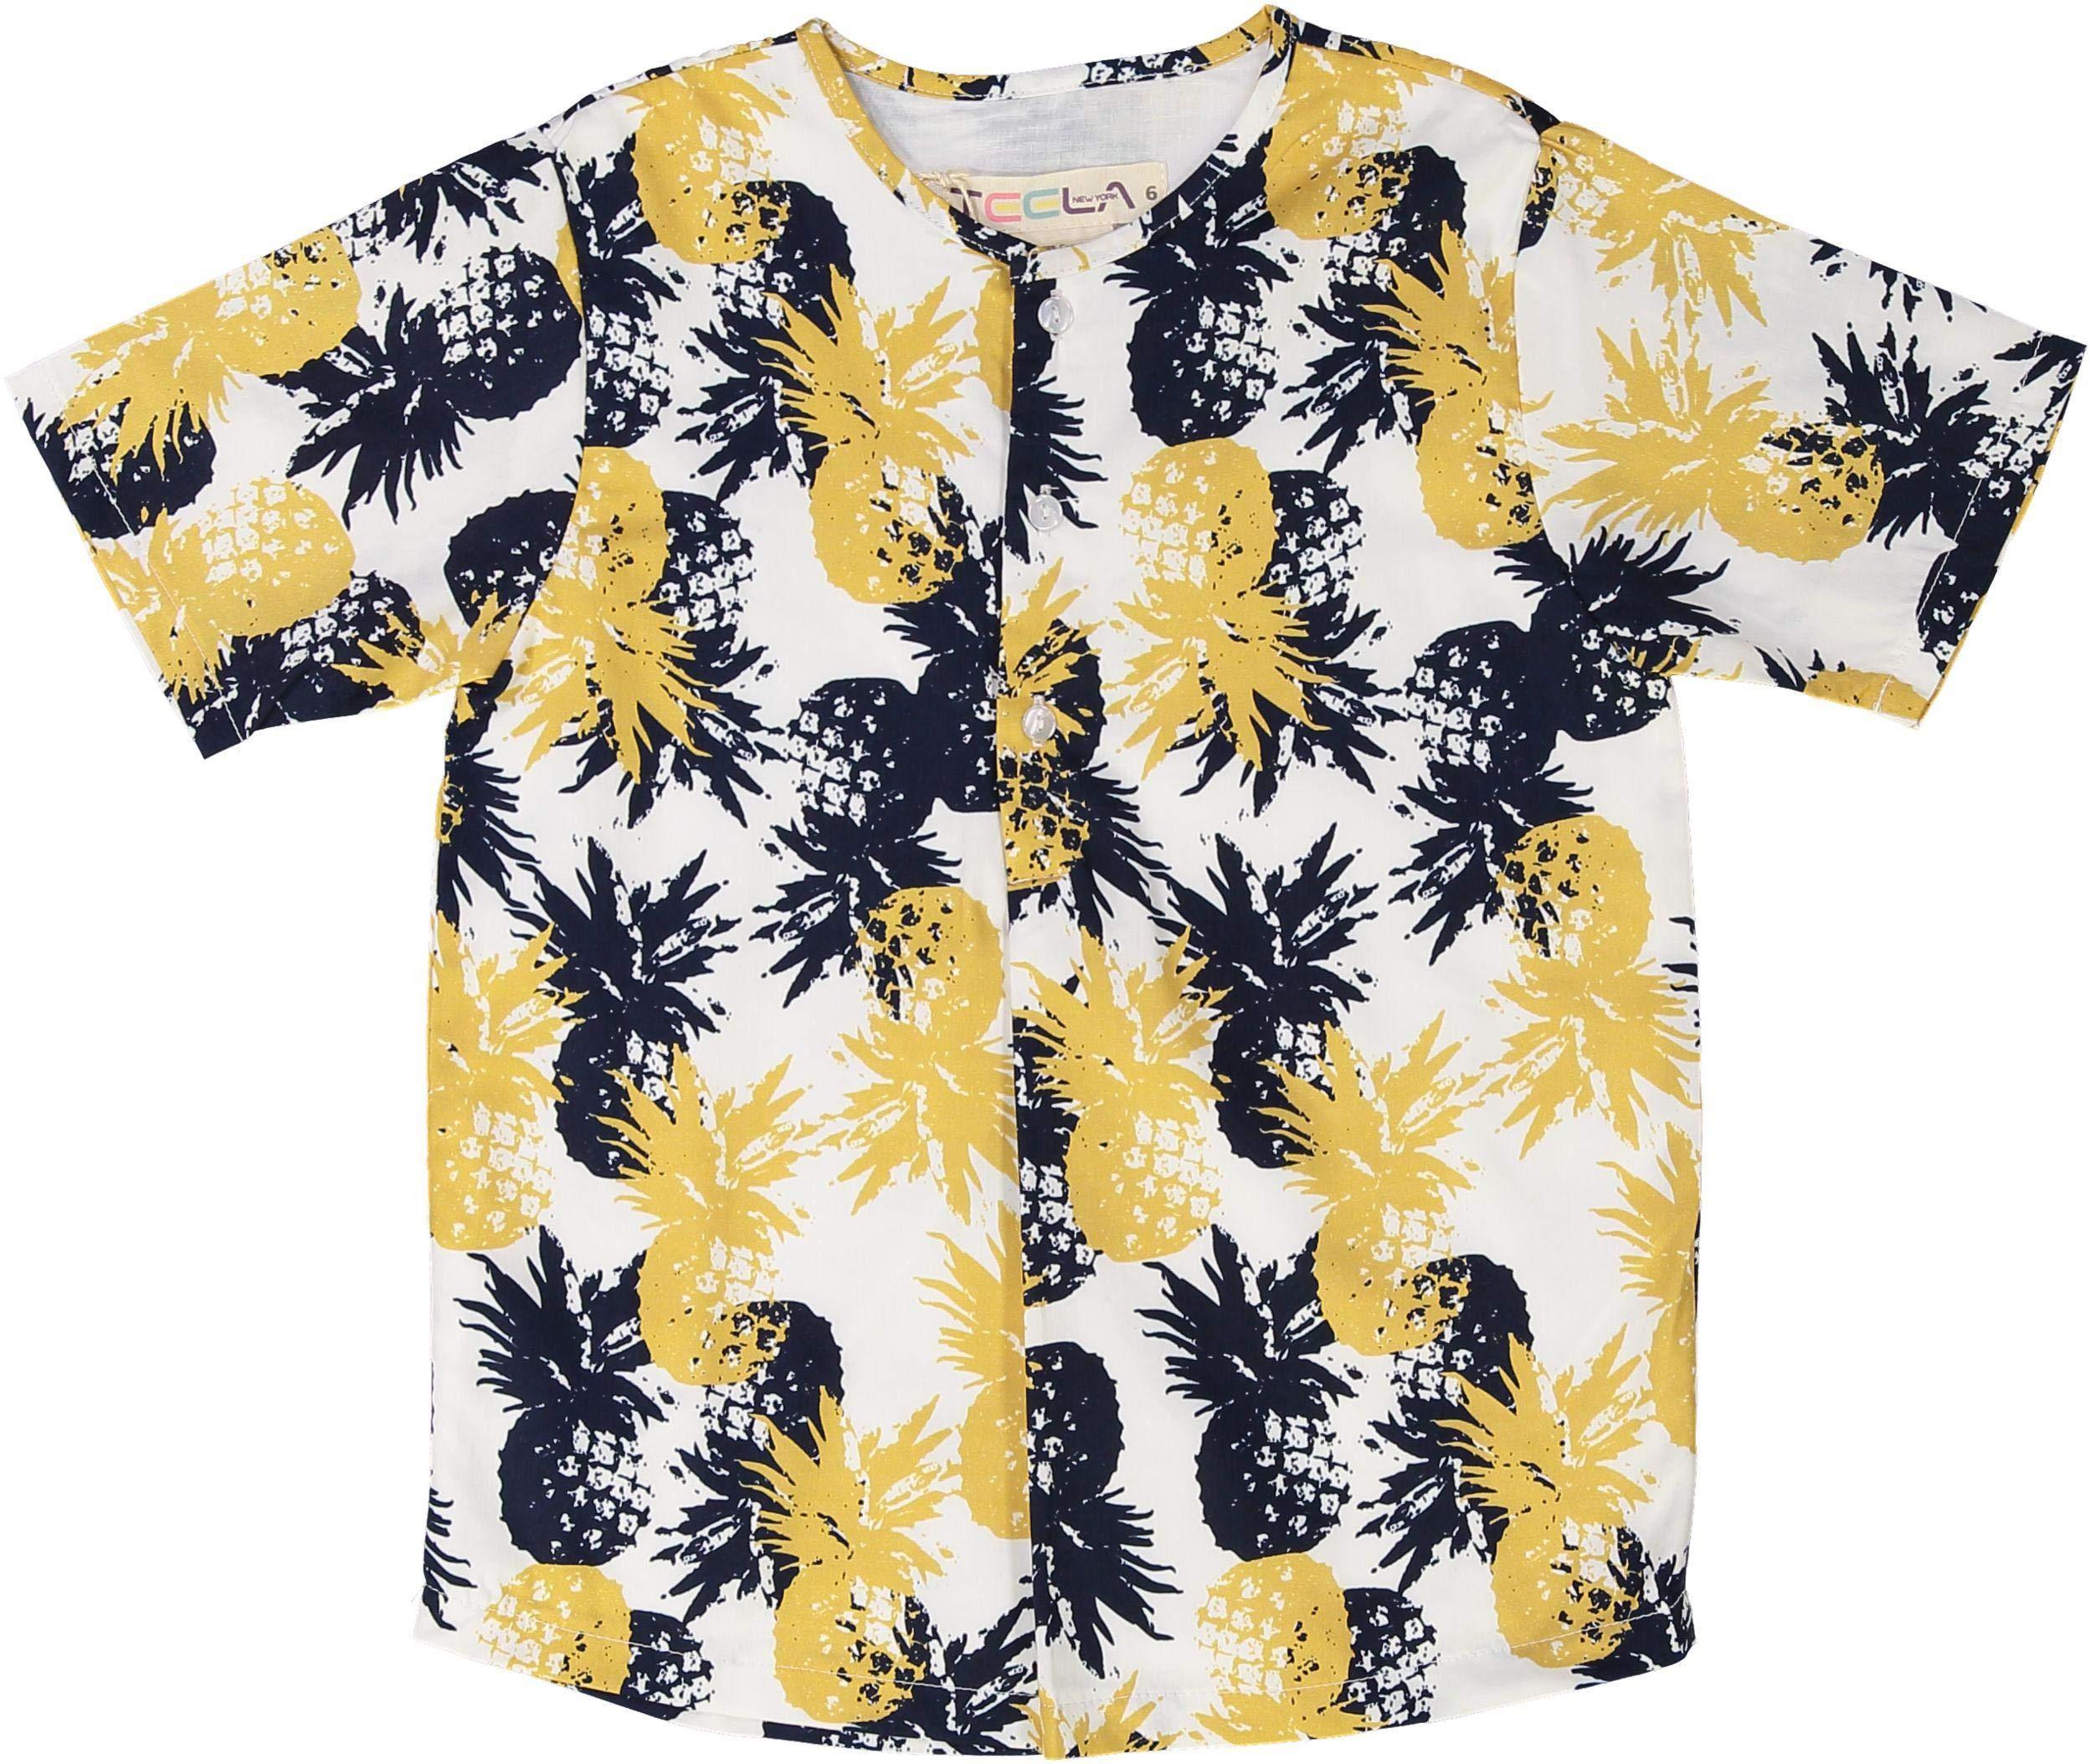 Teela Boys Short Sleeve Dress Shirt with No Collar - SB09A - Pineapple, 5